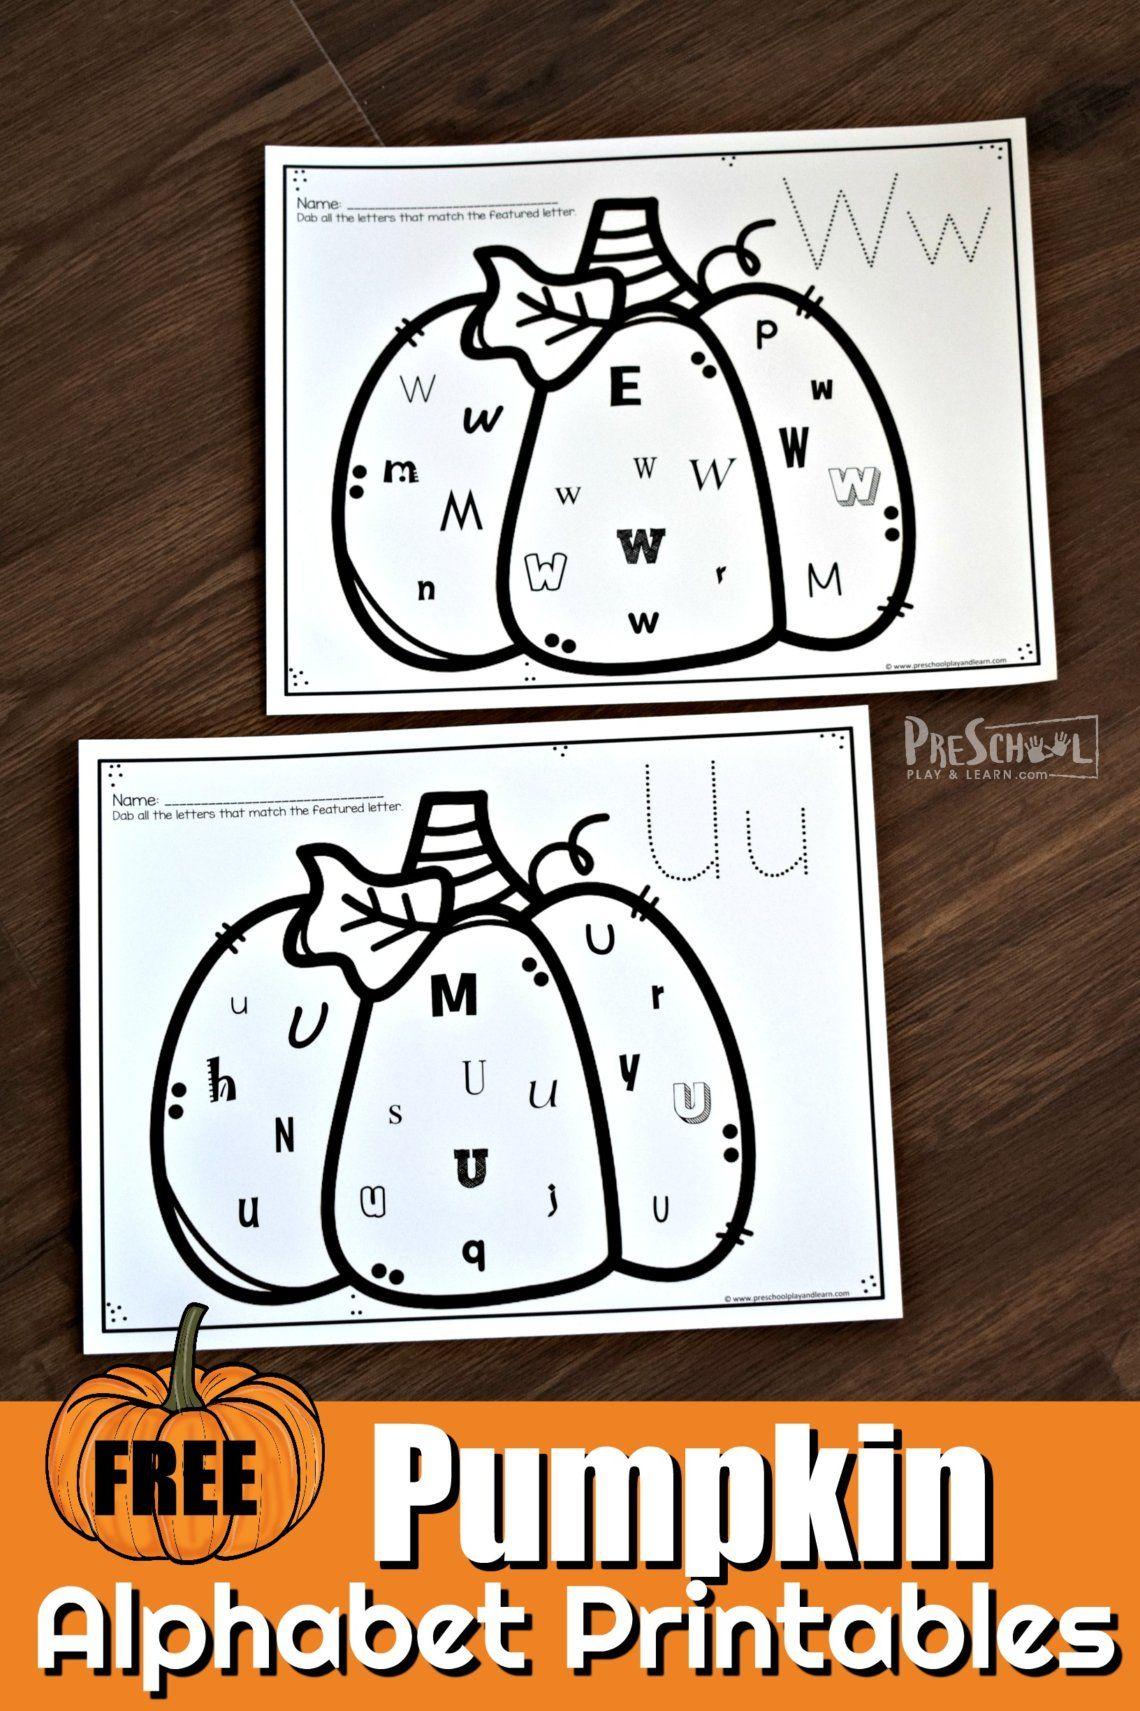 Free Pumpkin Alphabet Printables